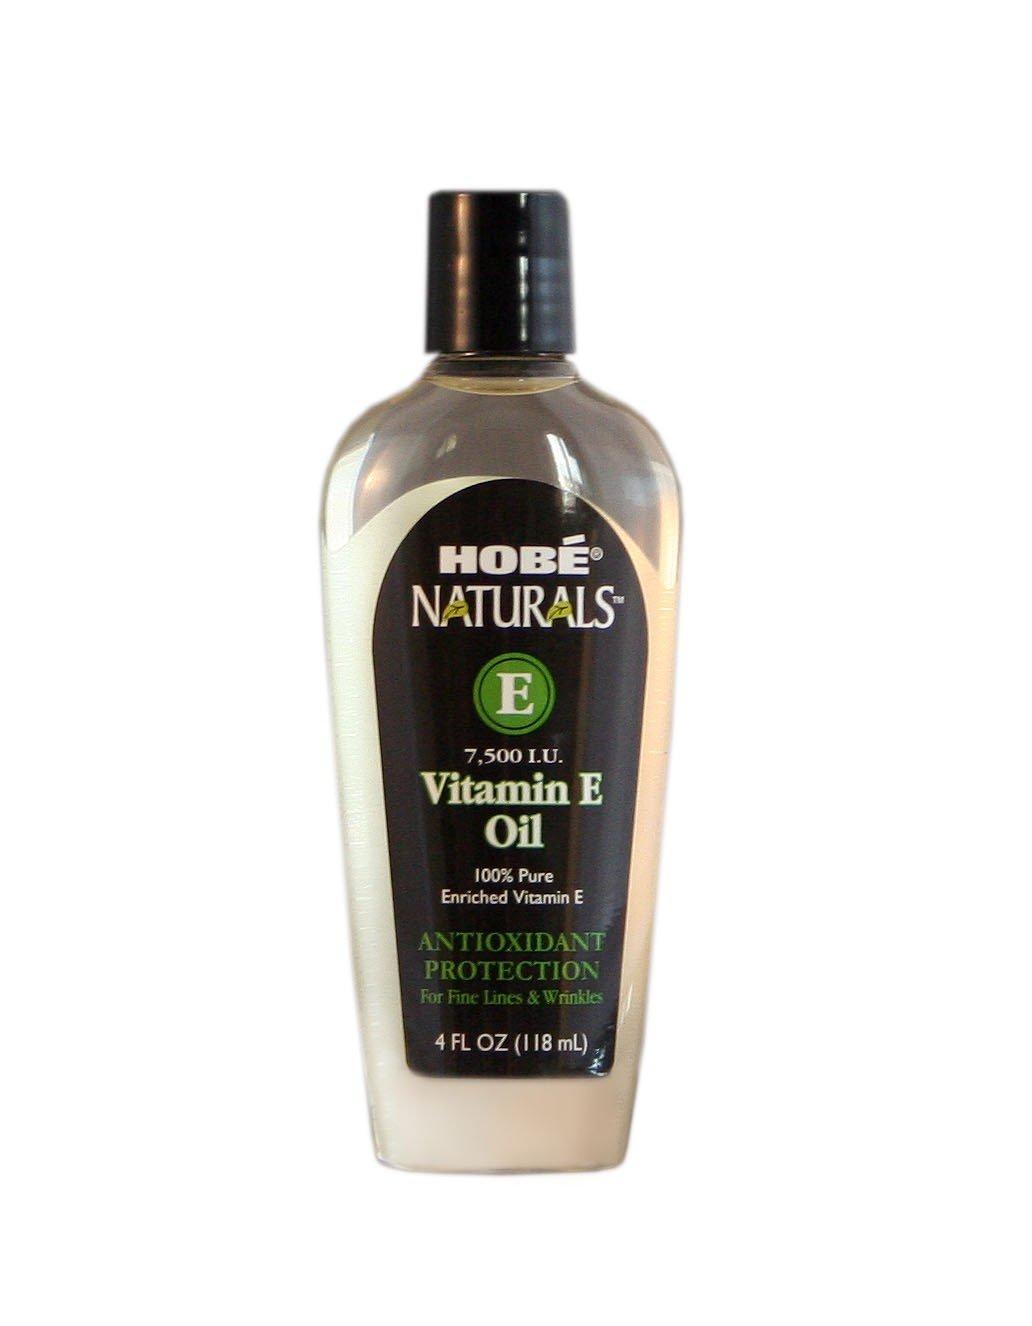 Hobe Naturals Vitamin E Oil, 7,500 IU, 4 Ounce